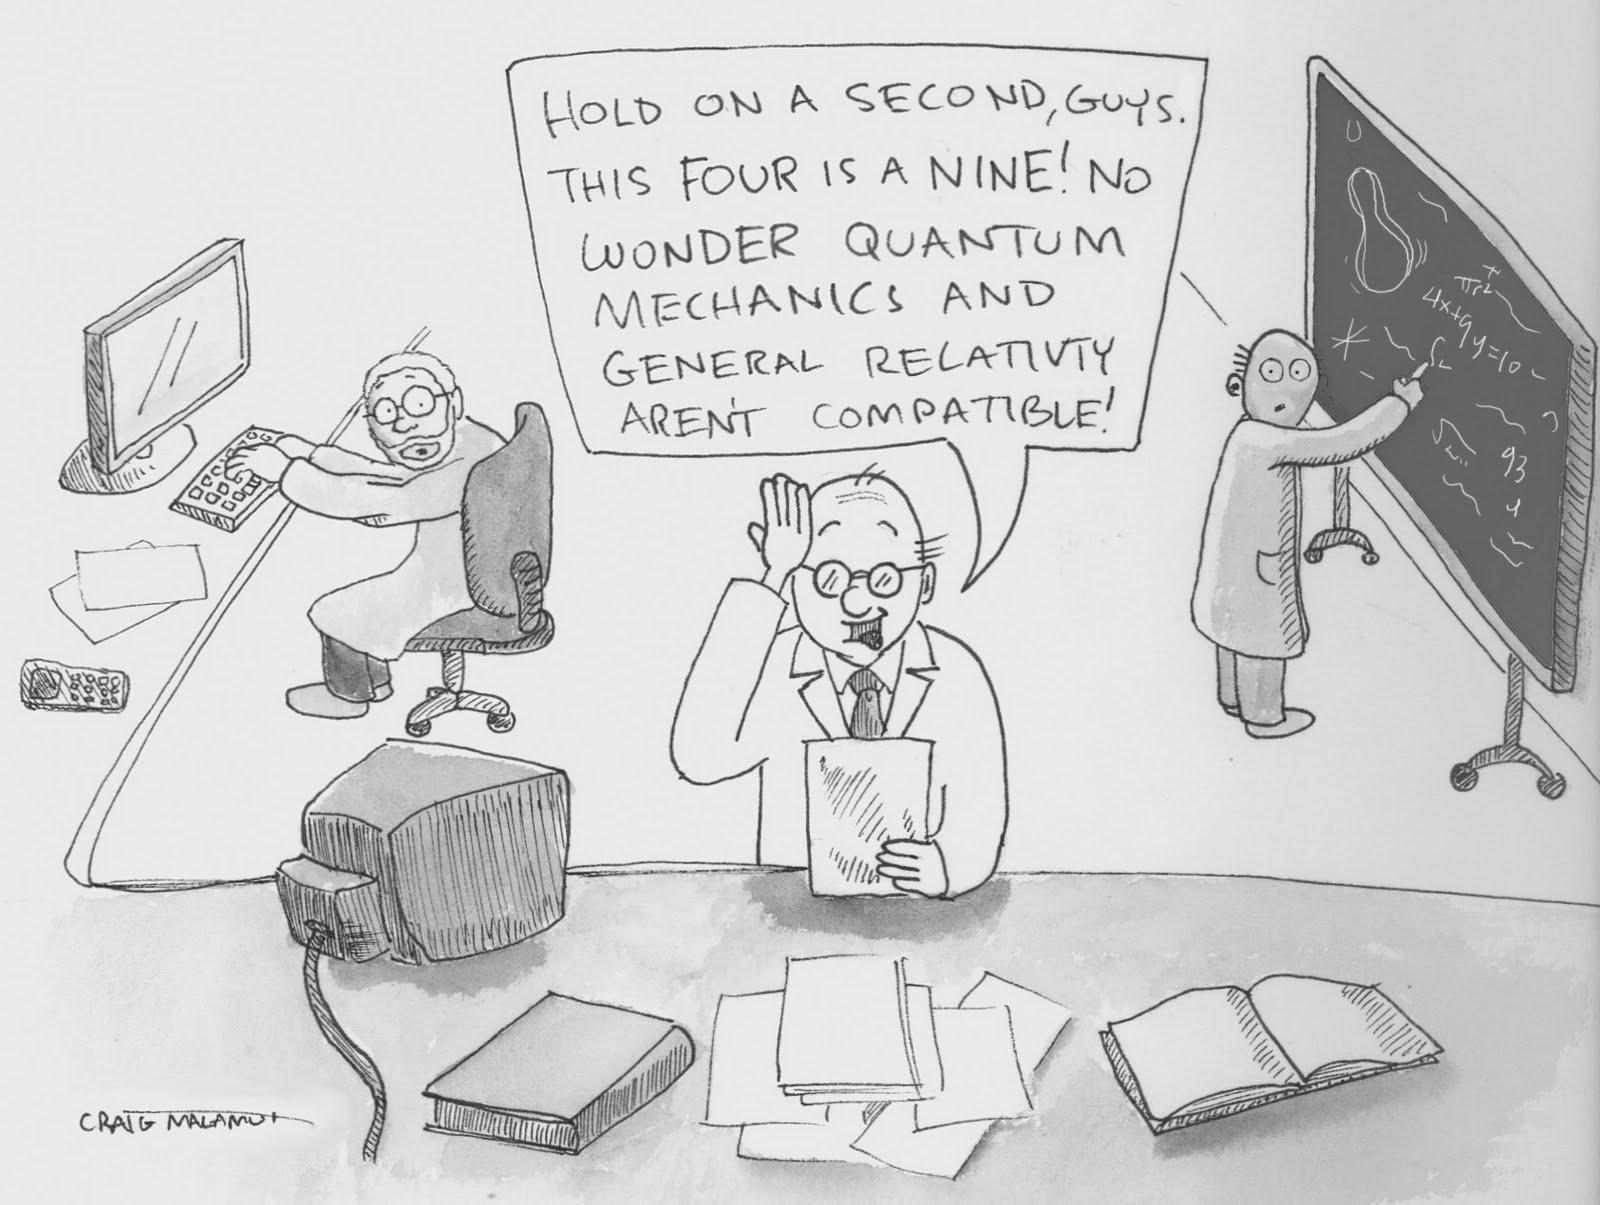 incompatibilità, relatività generale, meccanica quantistica